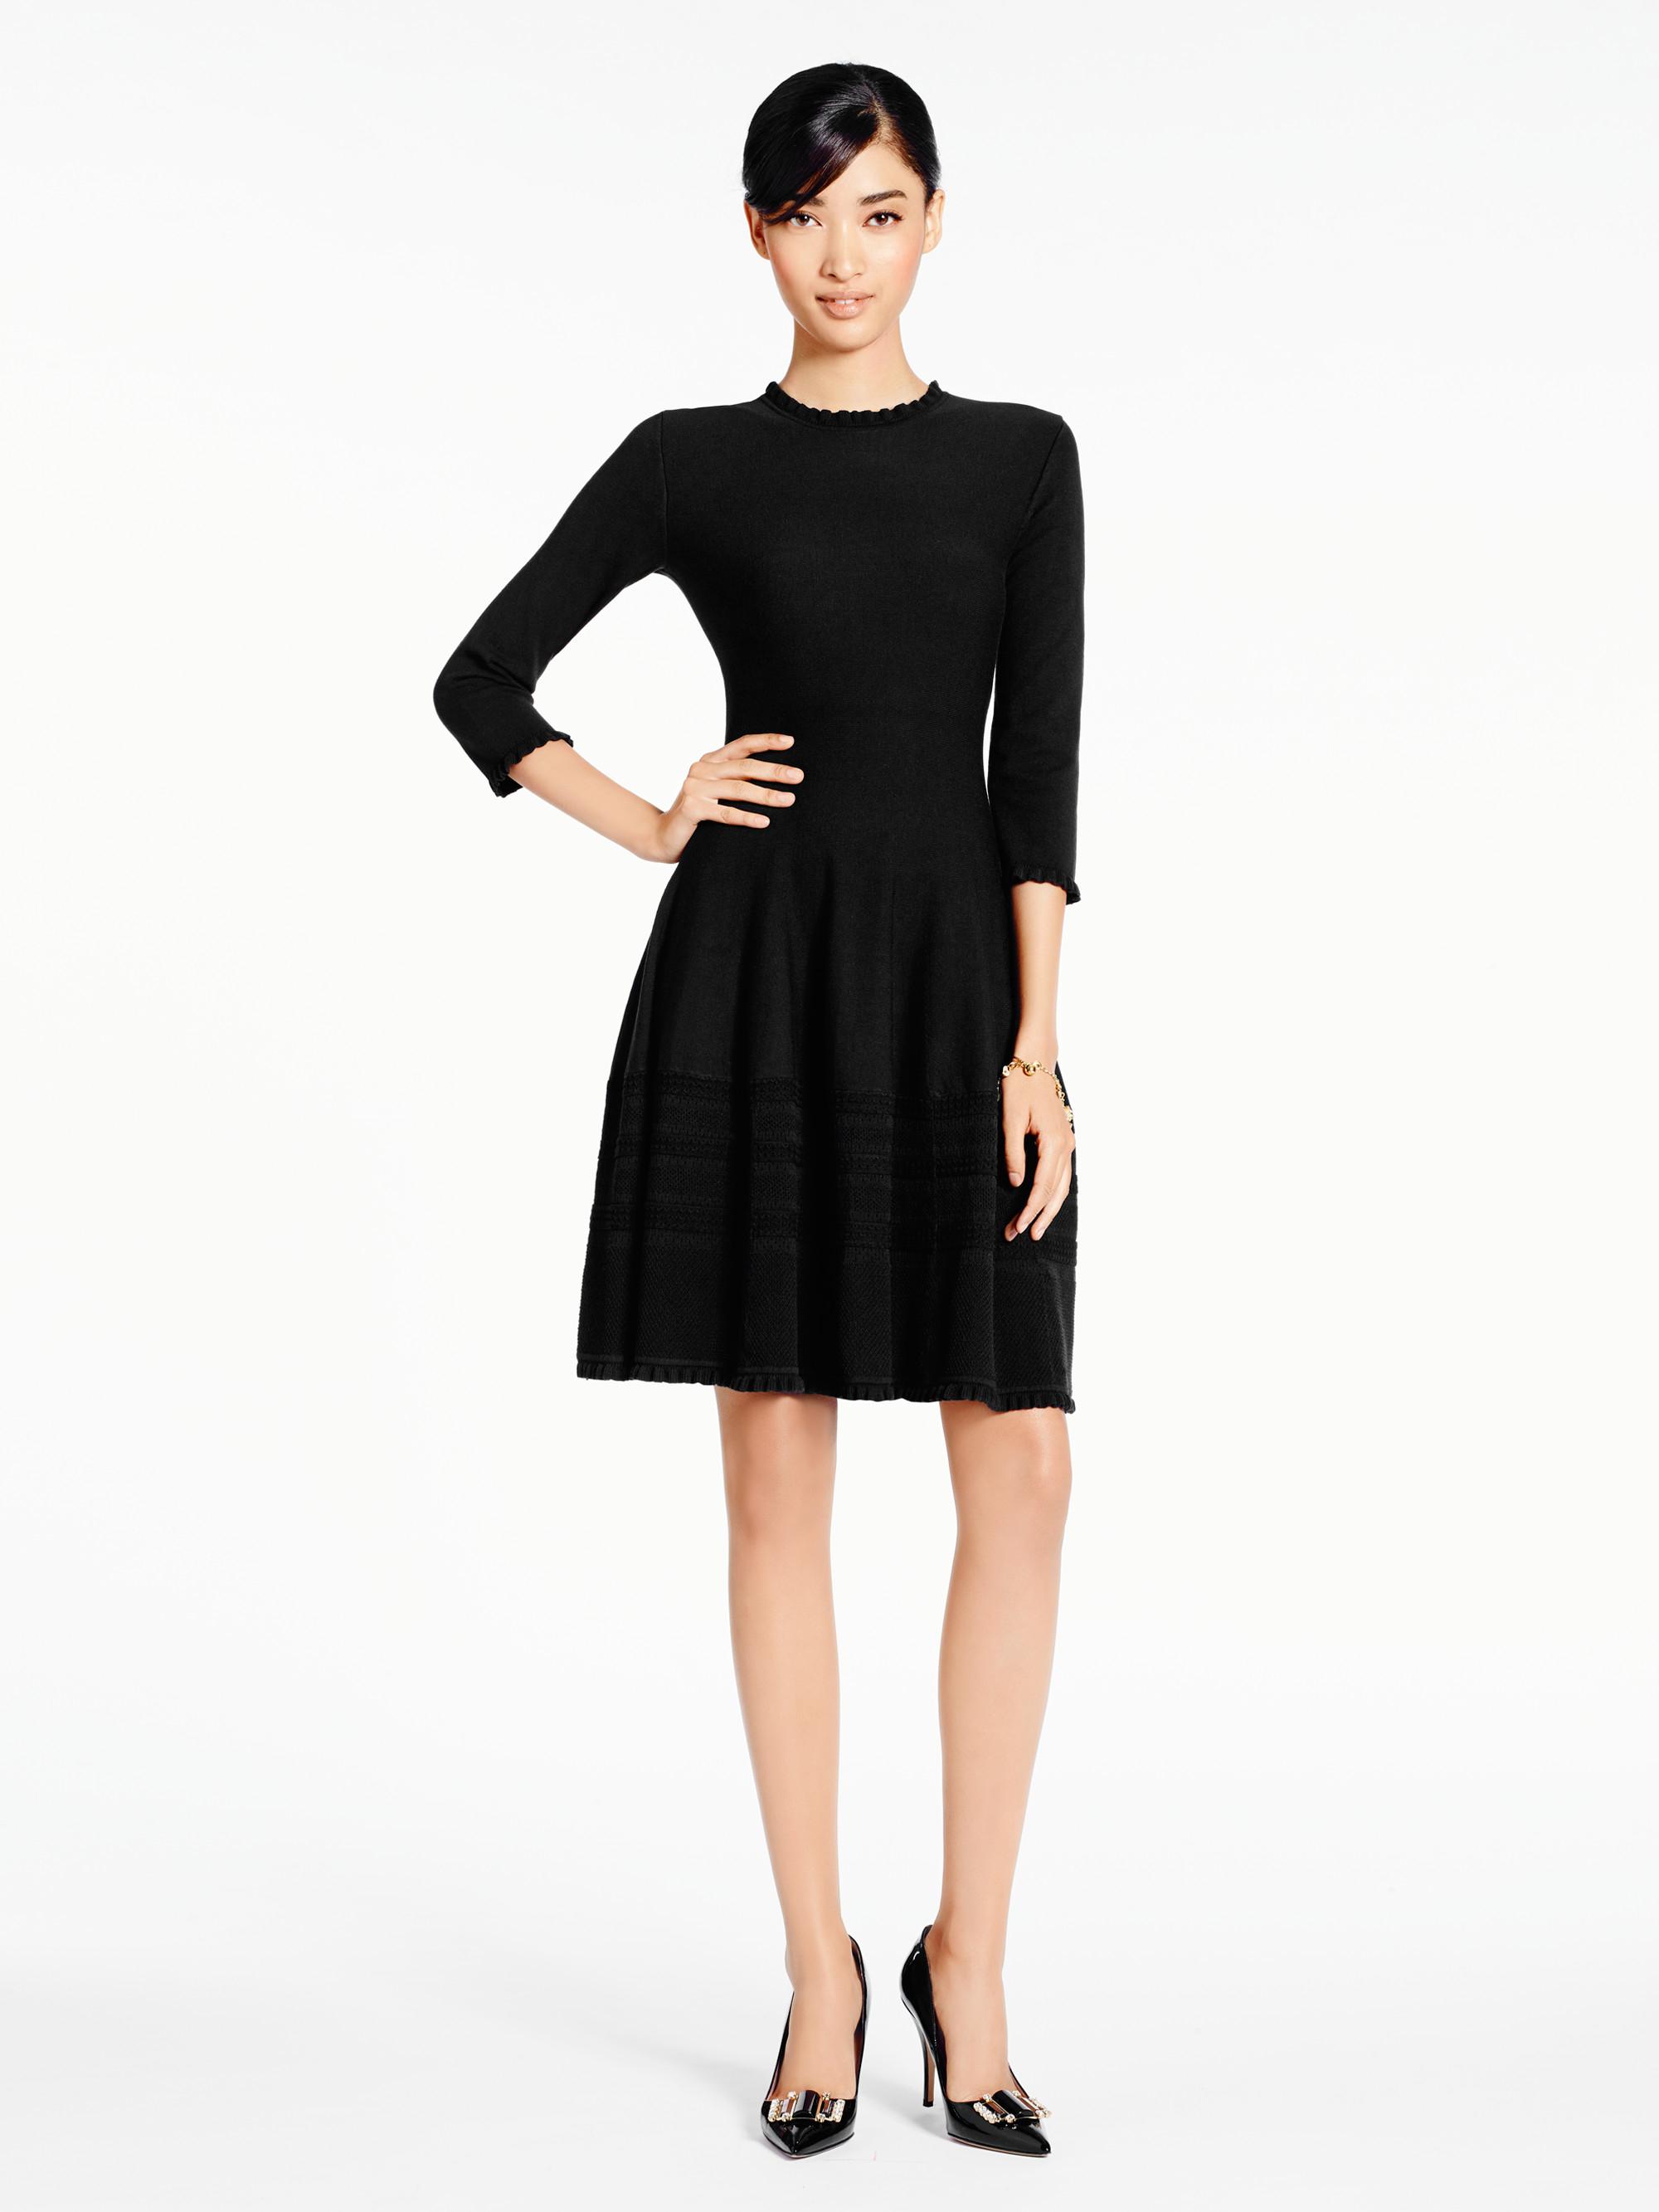 Lyst Kate Spade New York Pointelle Sweater Dress In Black